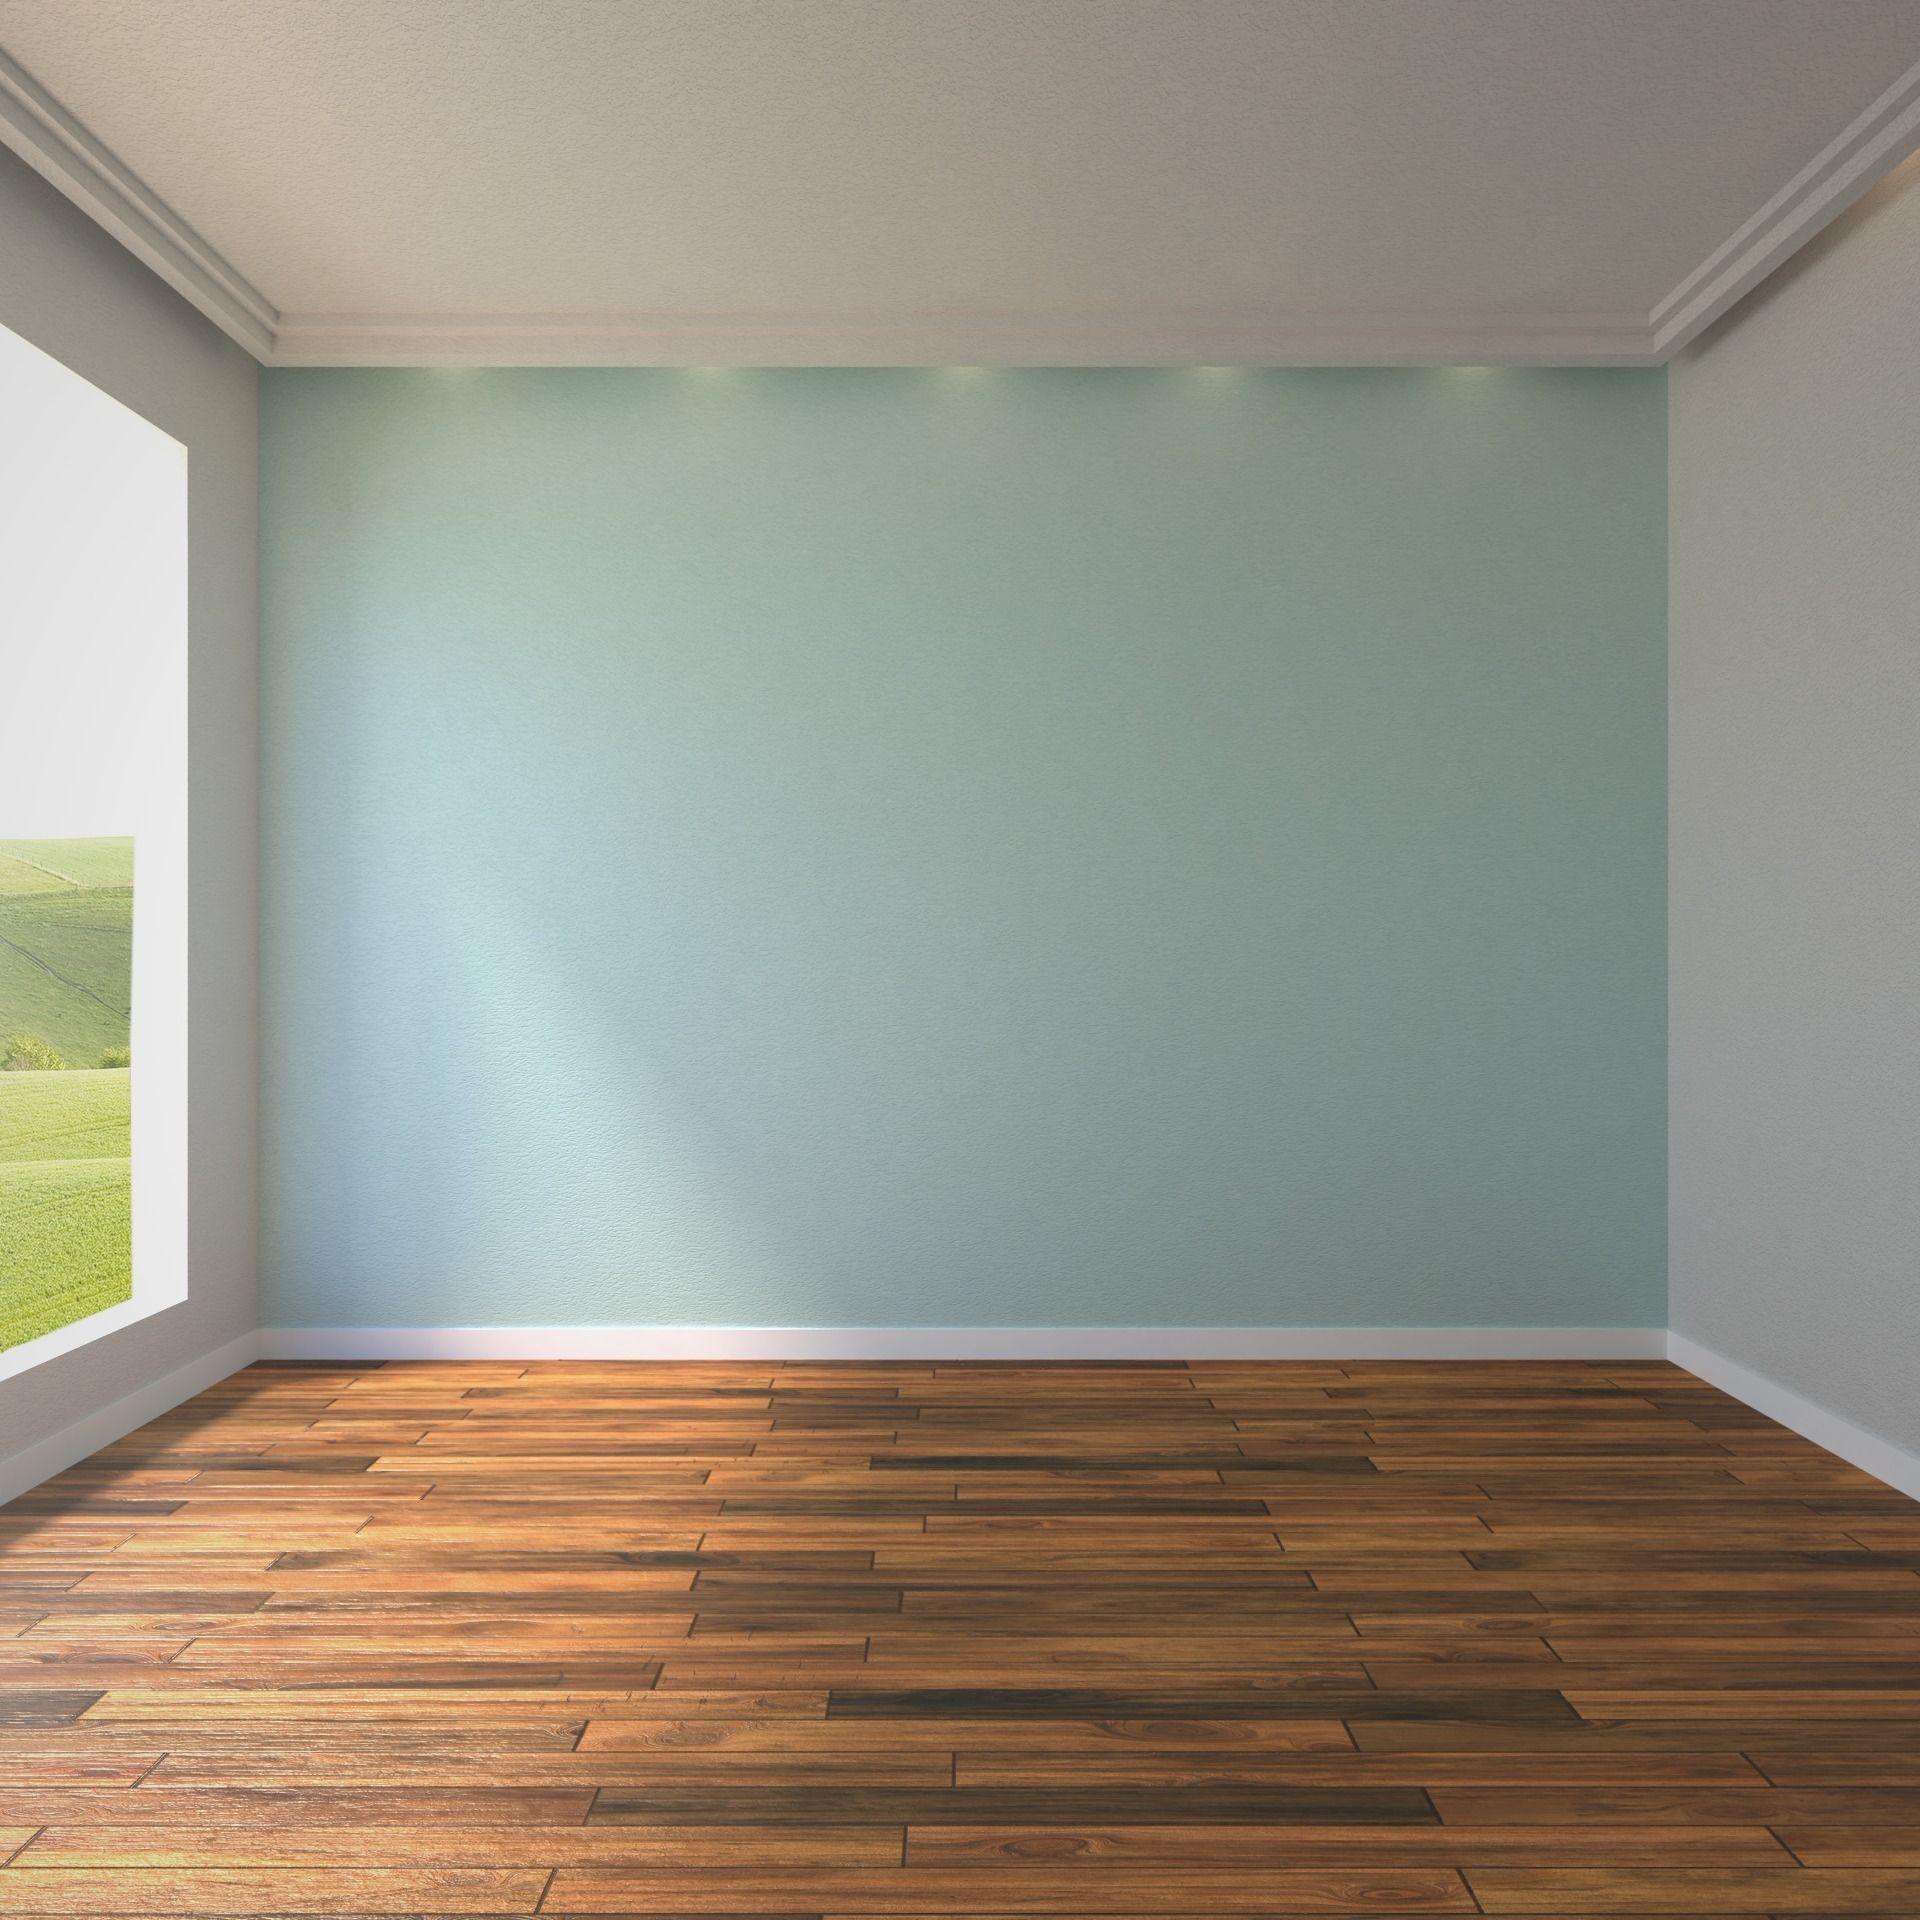 Empty Room 3d Model Cgtrader